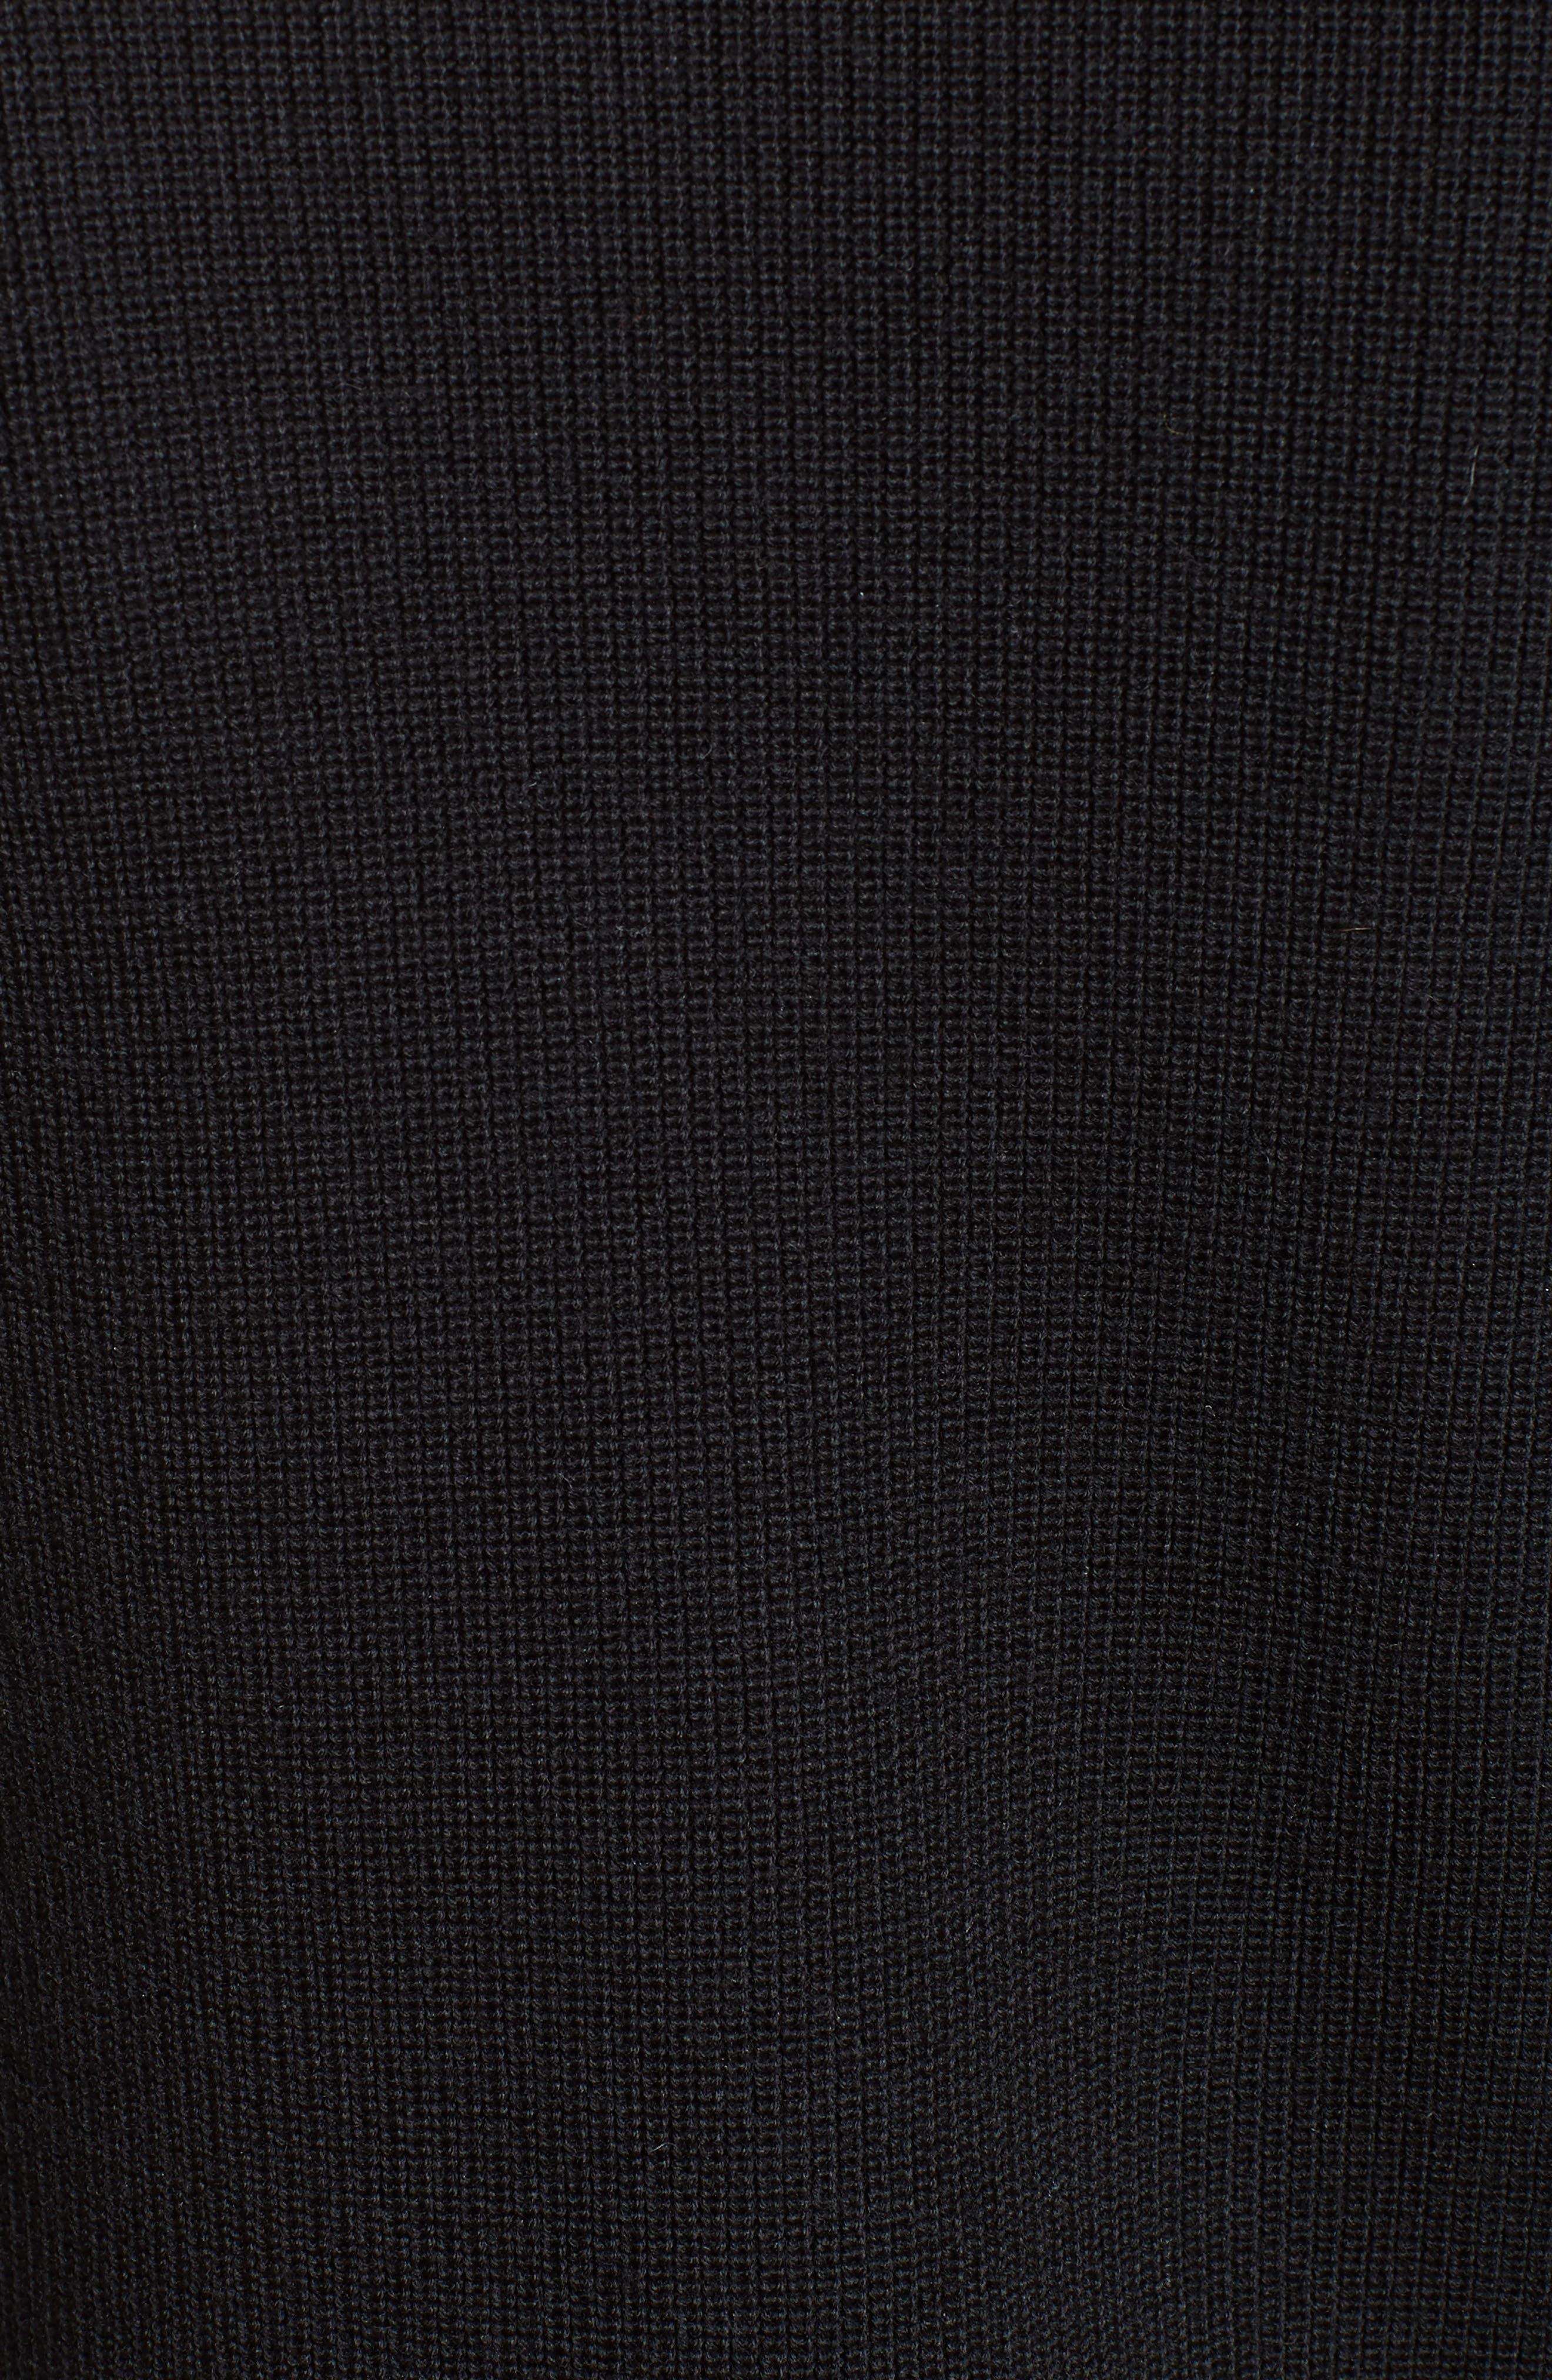 Meigan Merino Wool Sweater,                             Alternate thumbnail 5, color,                             001